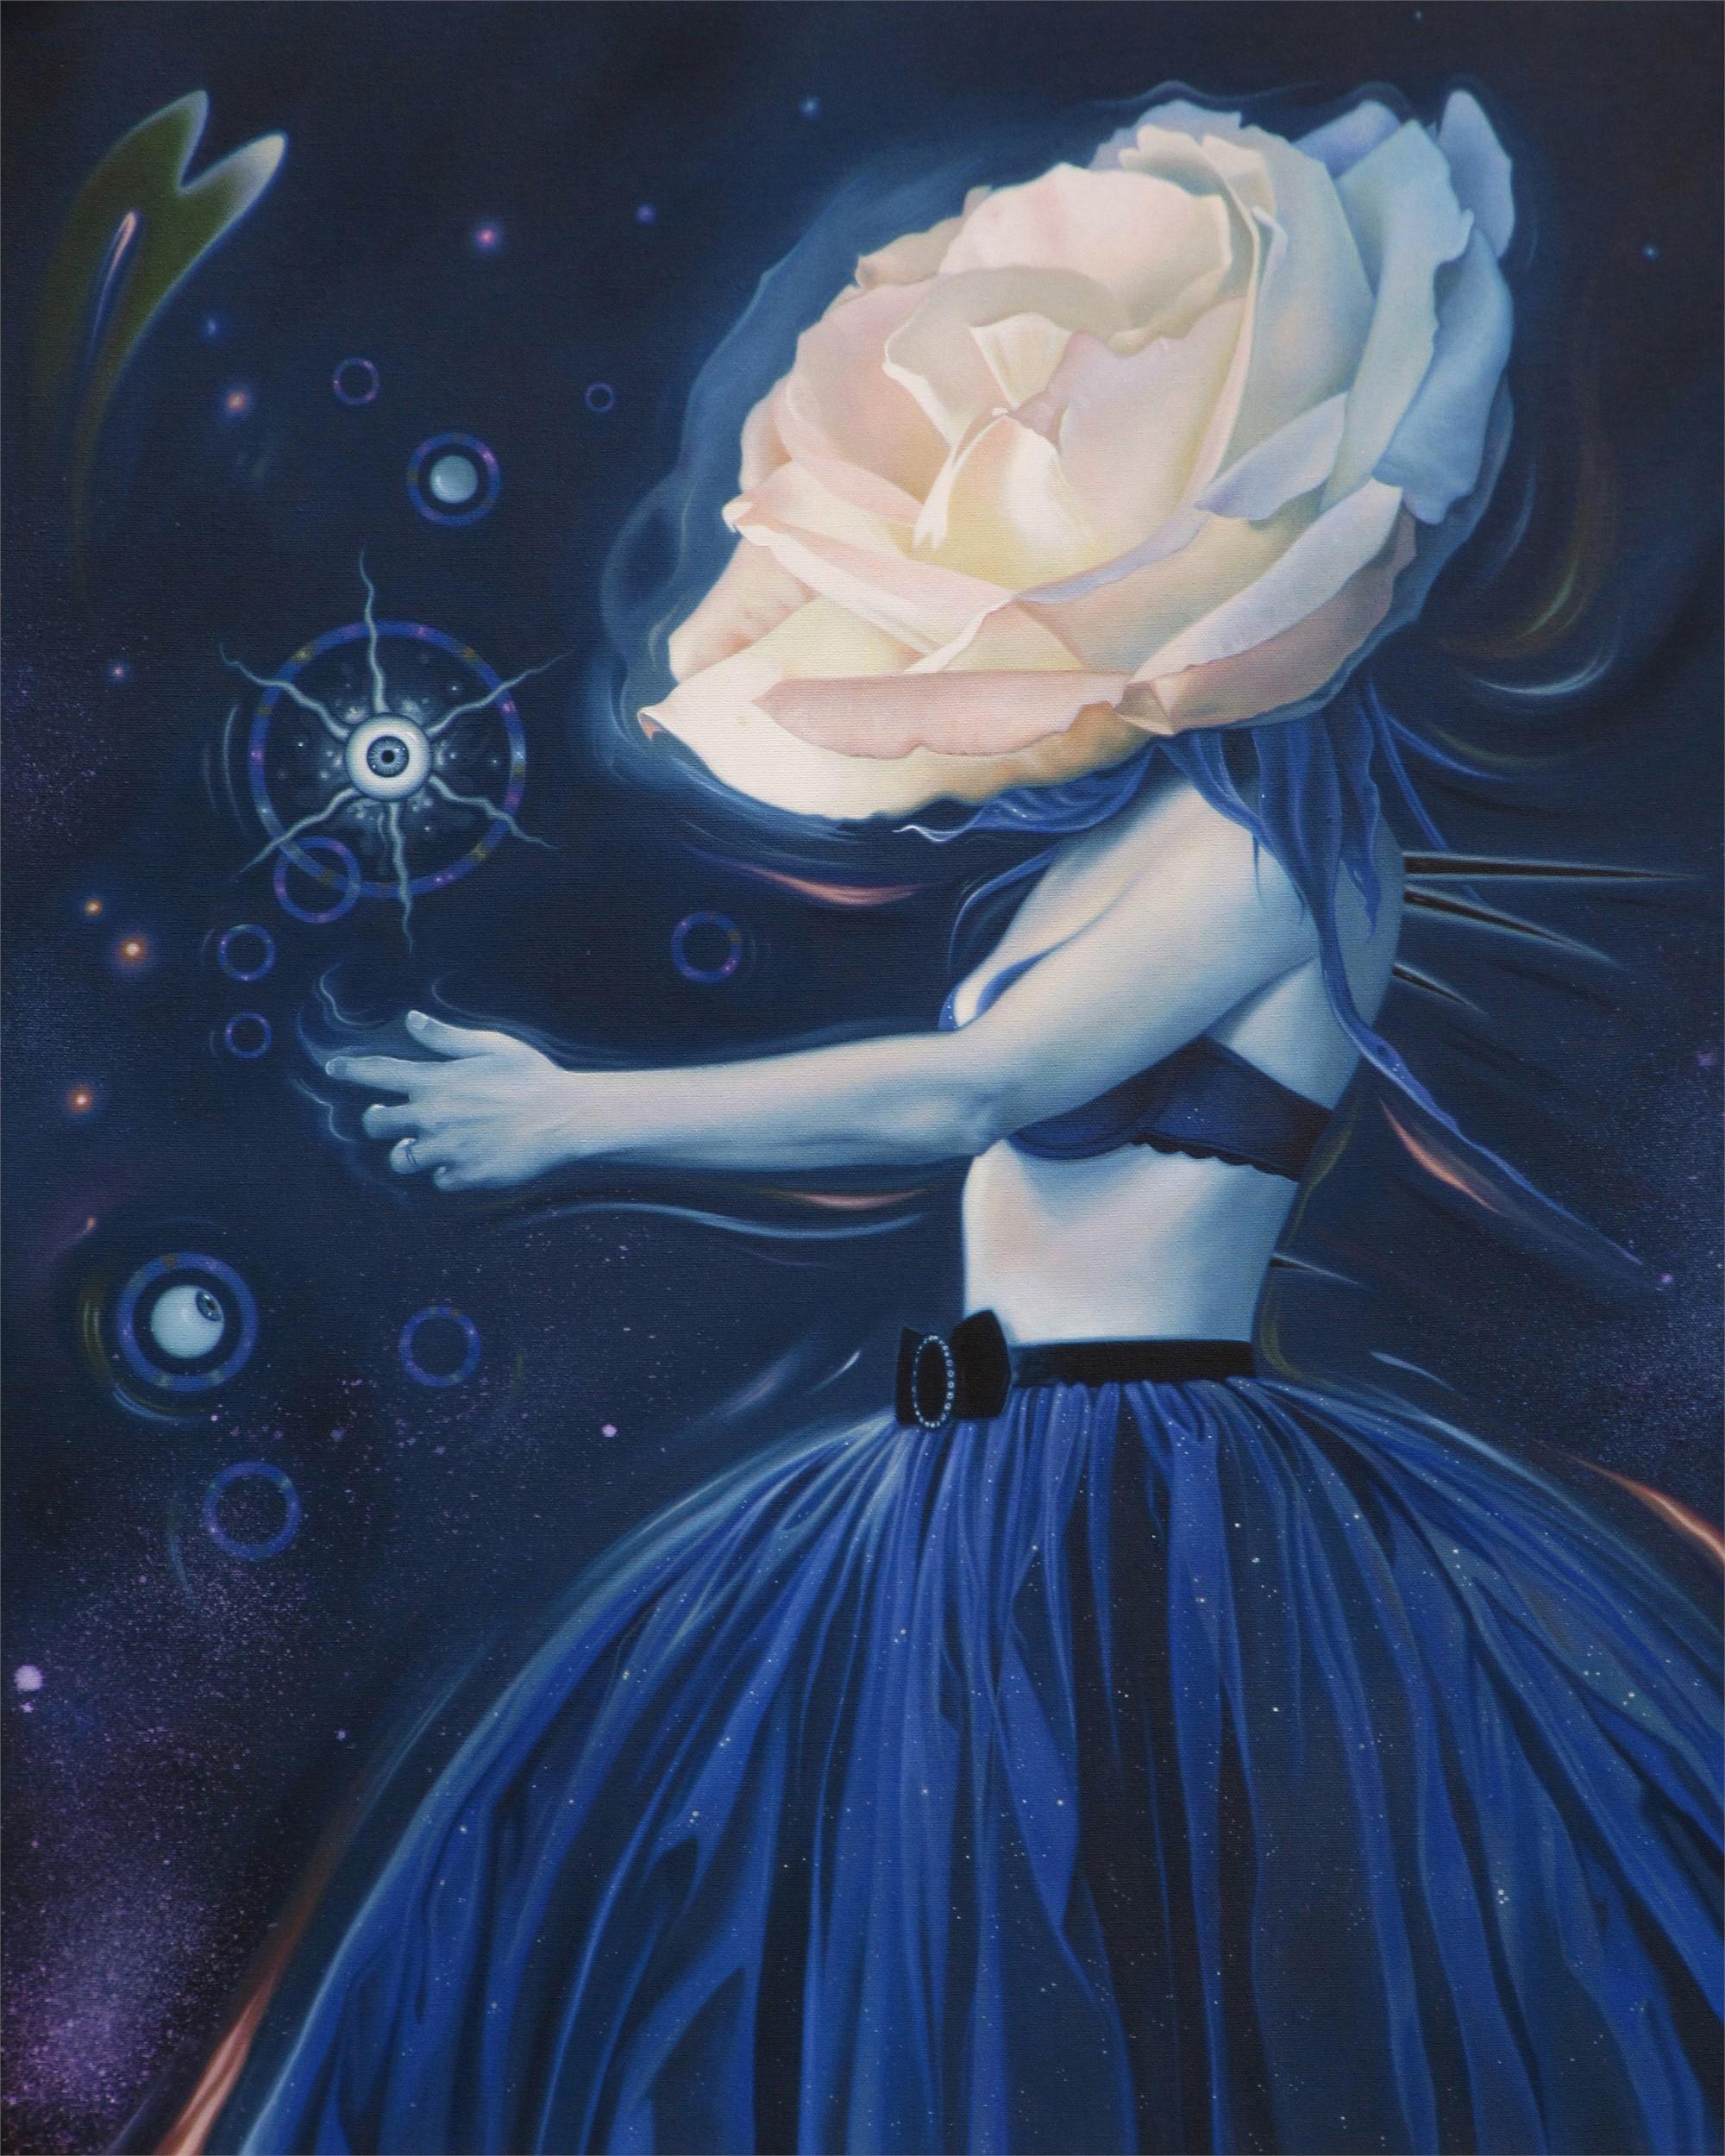 Transcendance by Sybiline